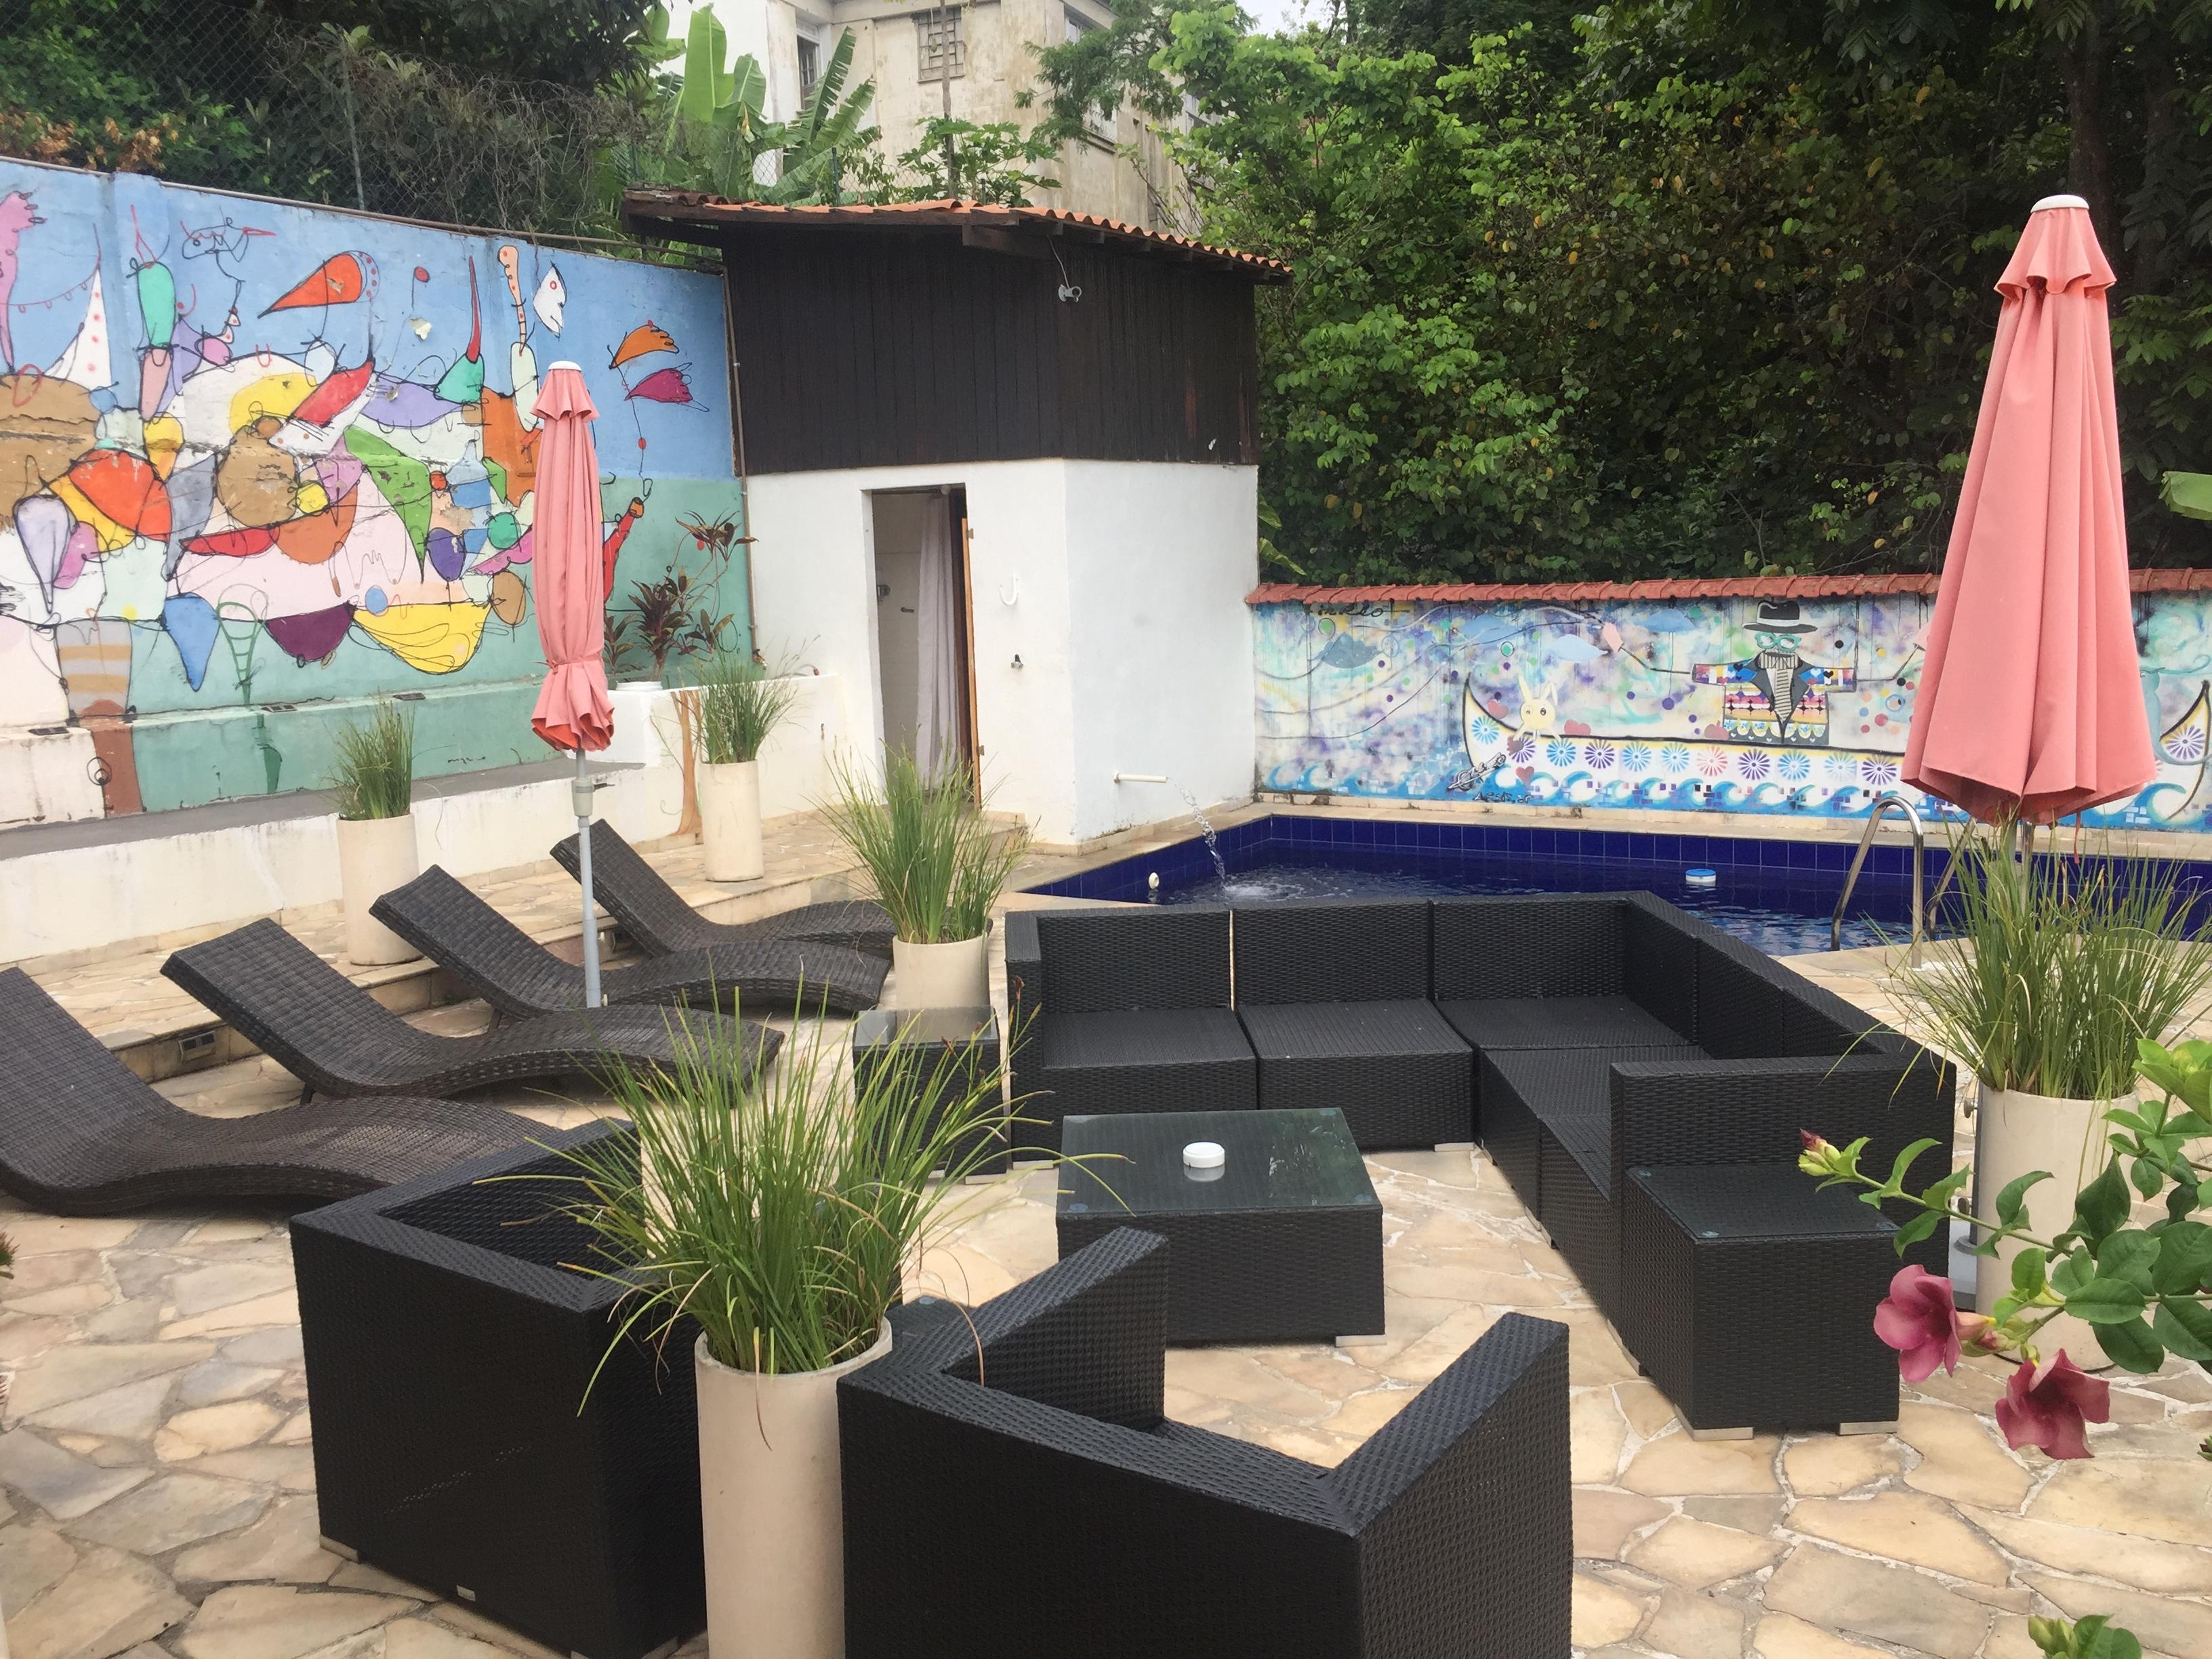 Bed and Breakfast in Rio de Janeiro - Casa Cool Beans Unique Hotels in Rio de Janeiro